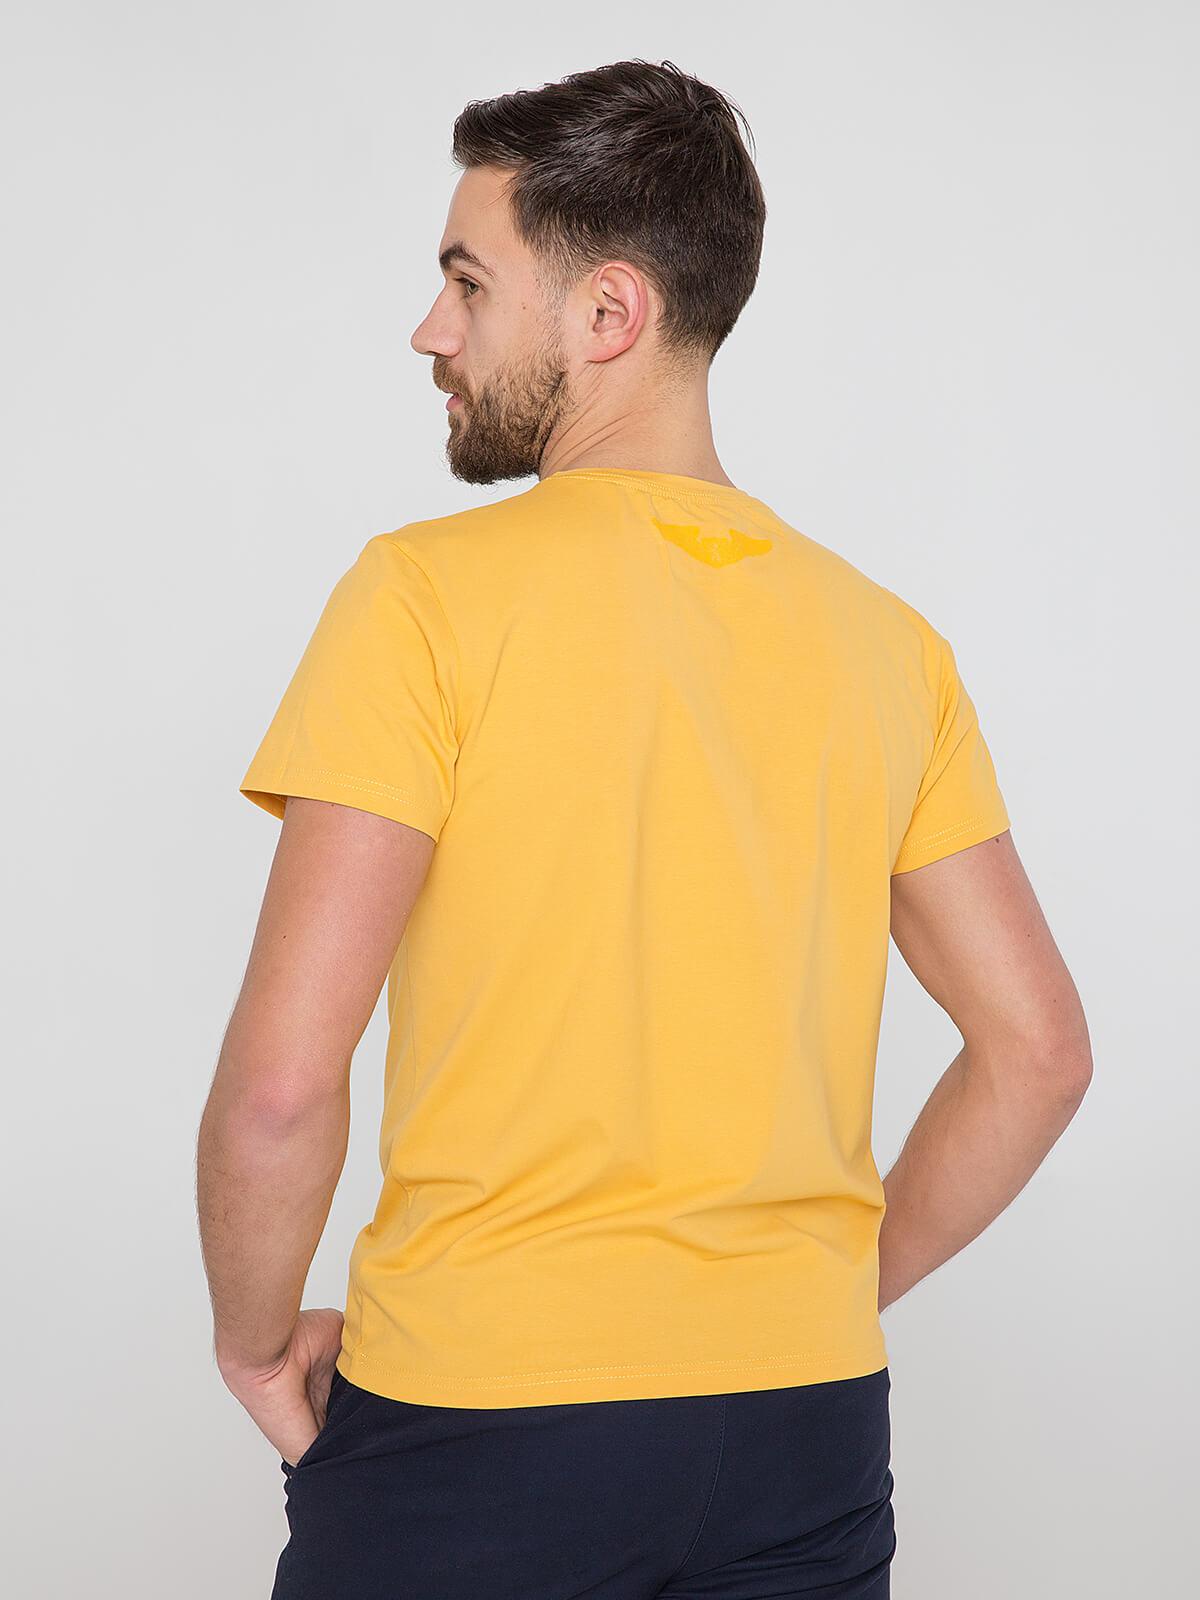 Men's T-Shirt Mriya. Color yellow.  Material: 95% cotton, 5% spandex.